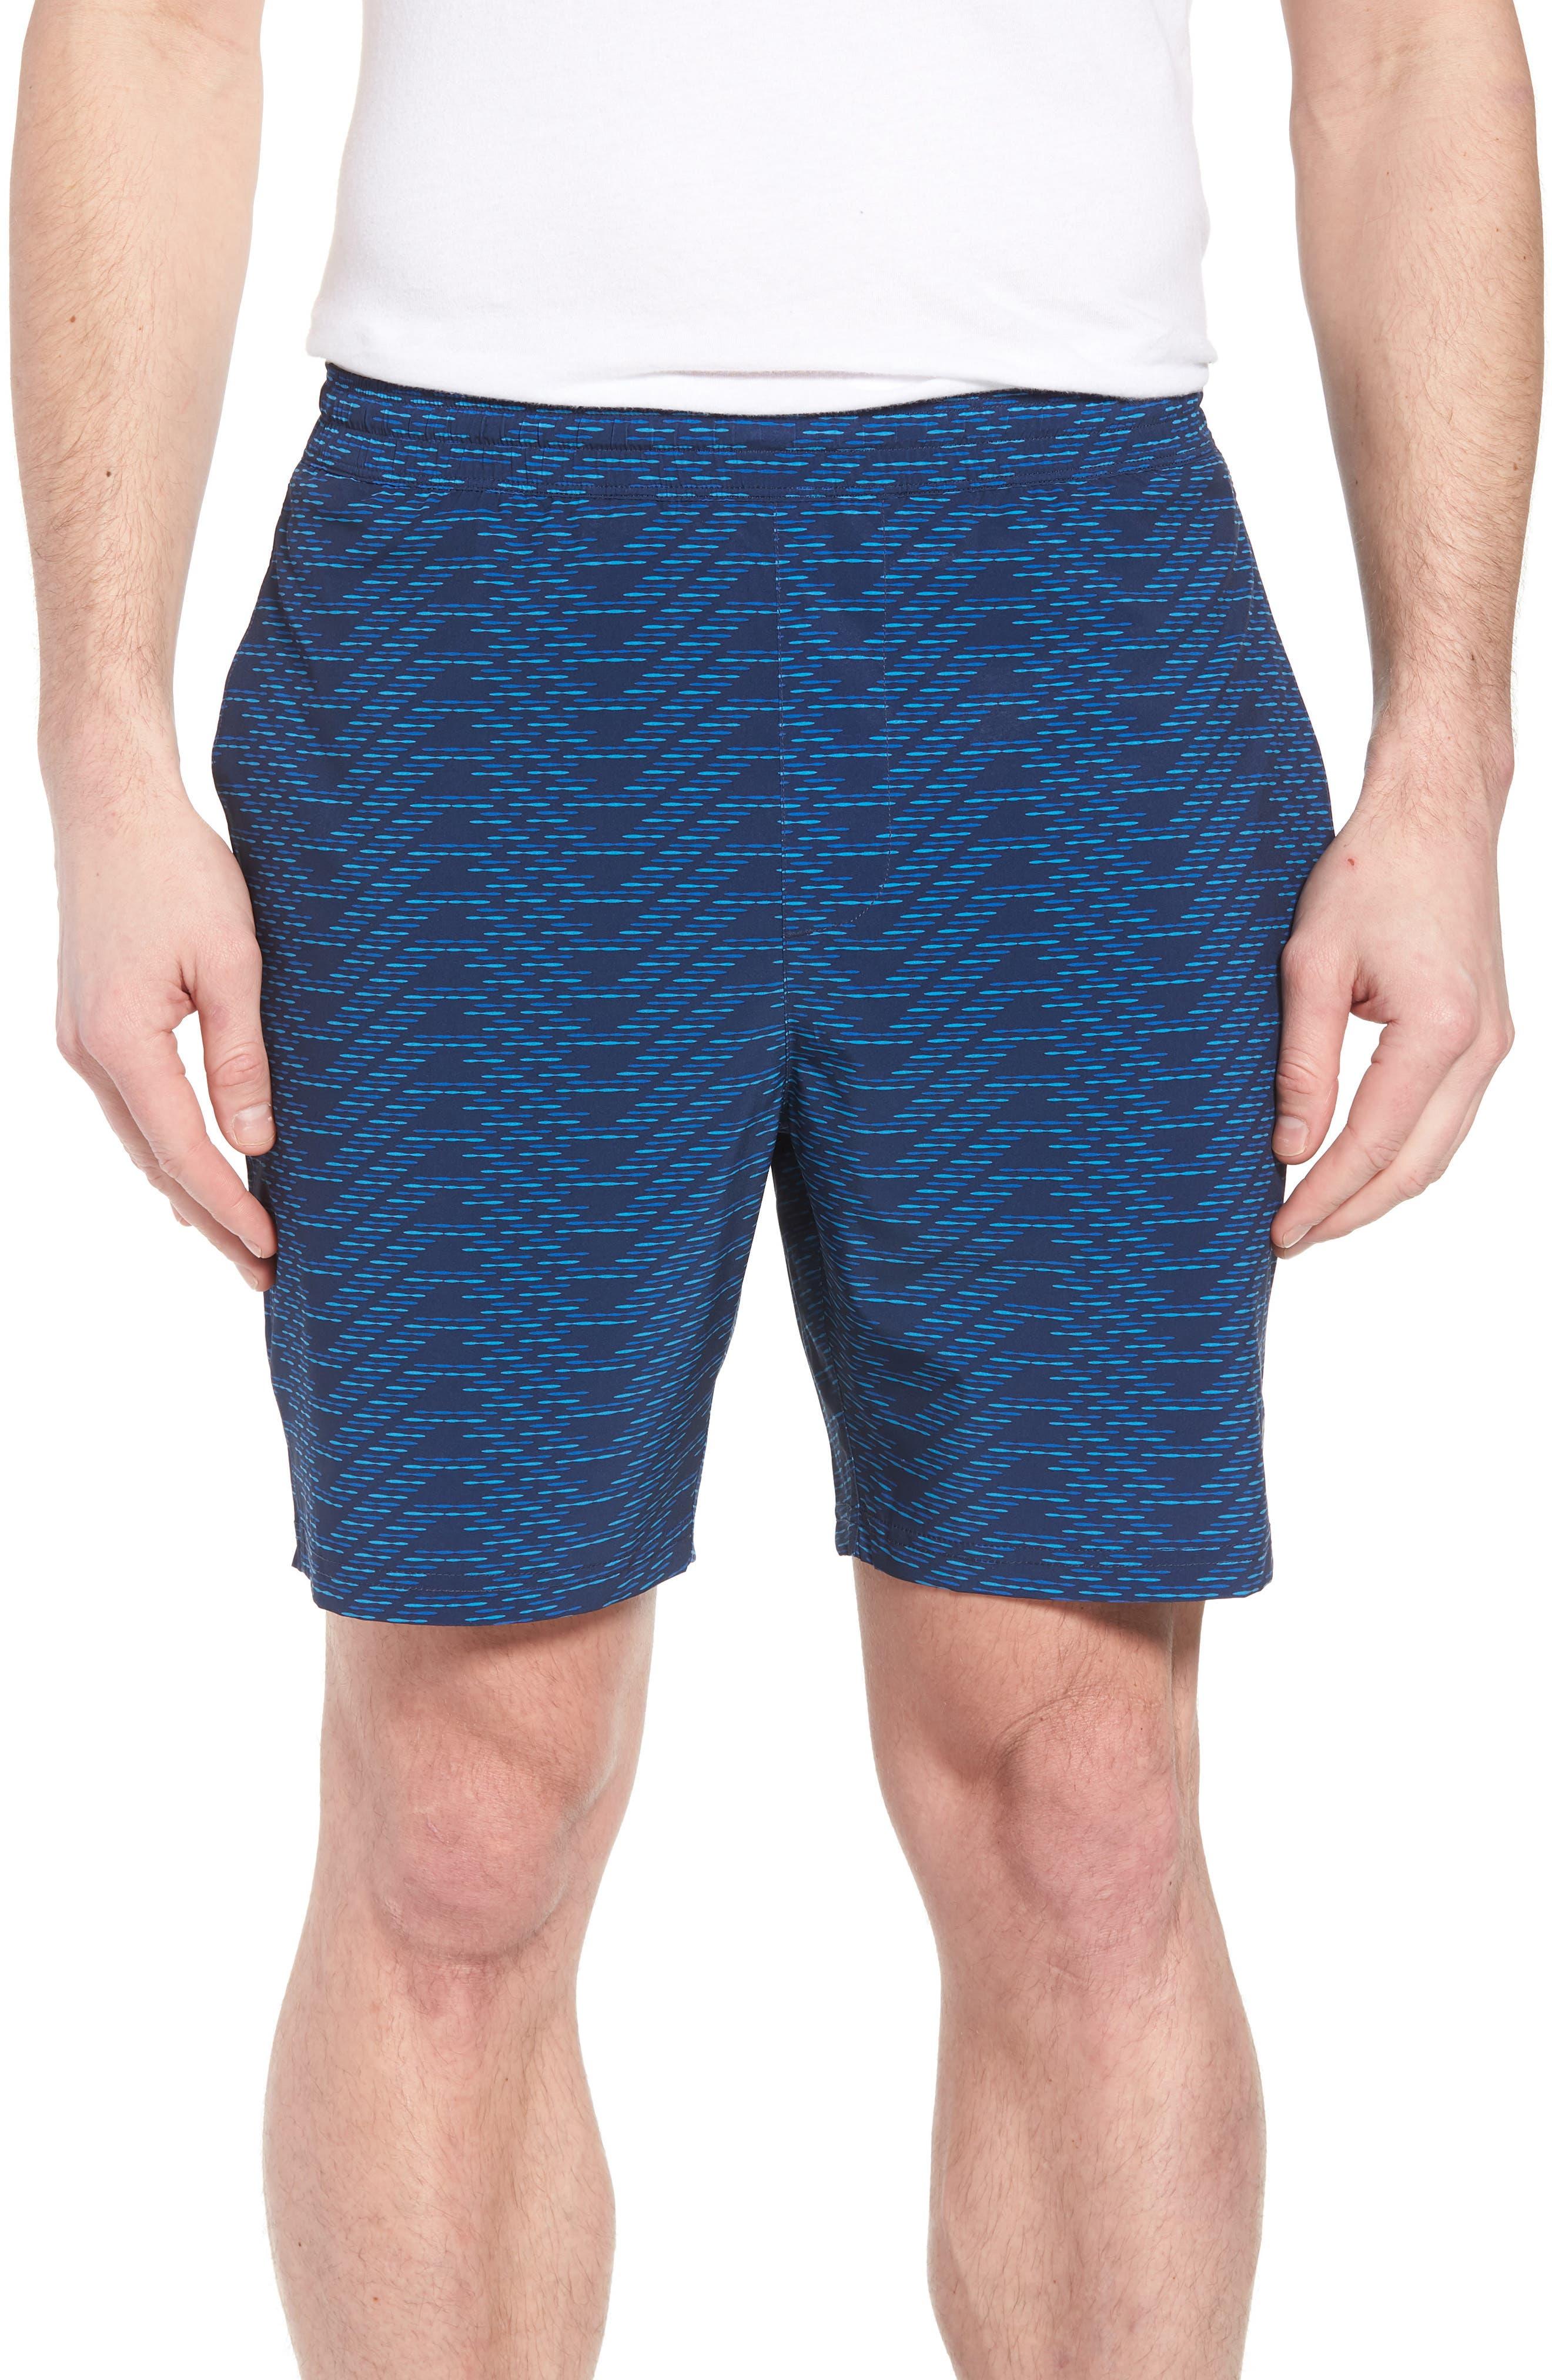 Stretch Shorts,                             Main thumbnail 1, color,                             CIRCUIT BREAKER